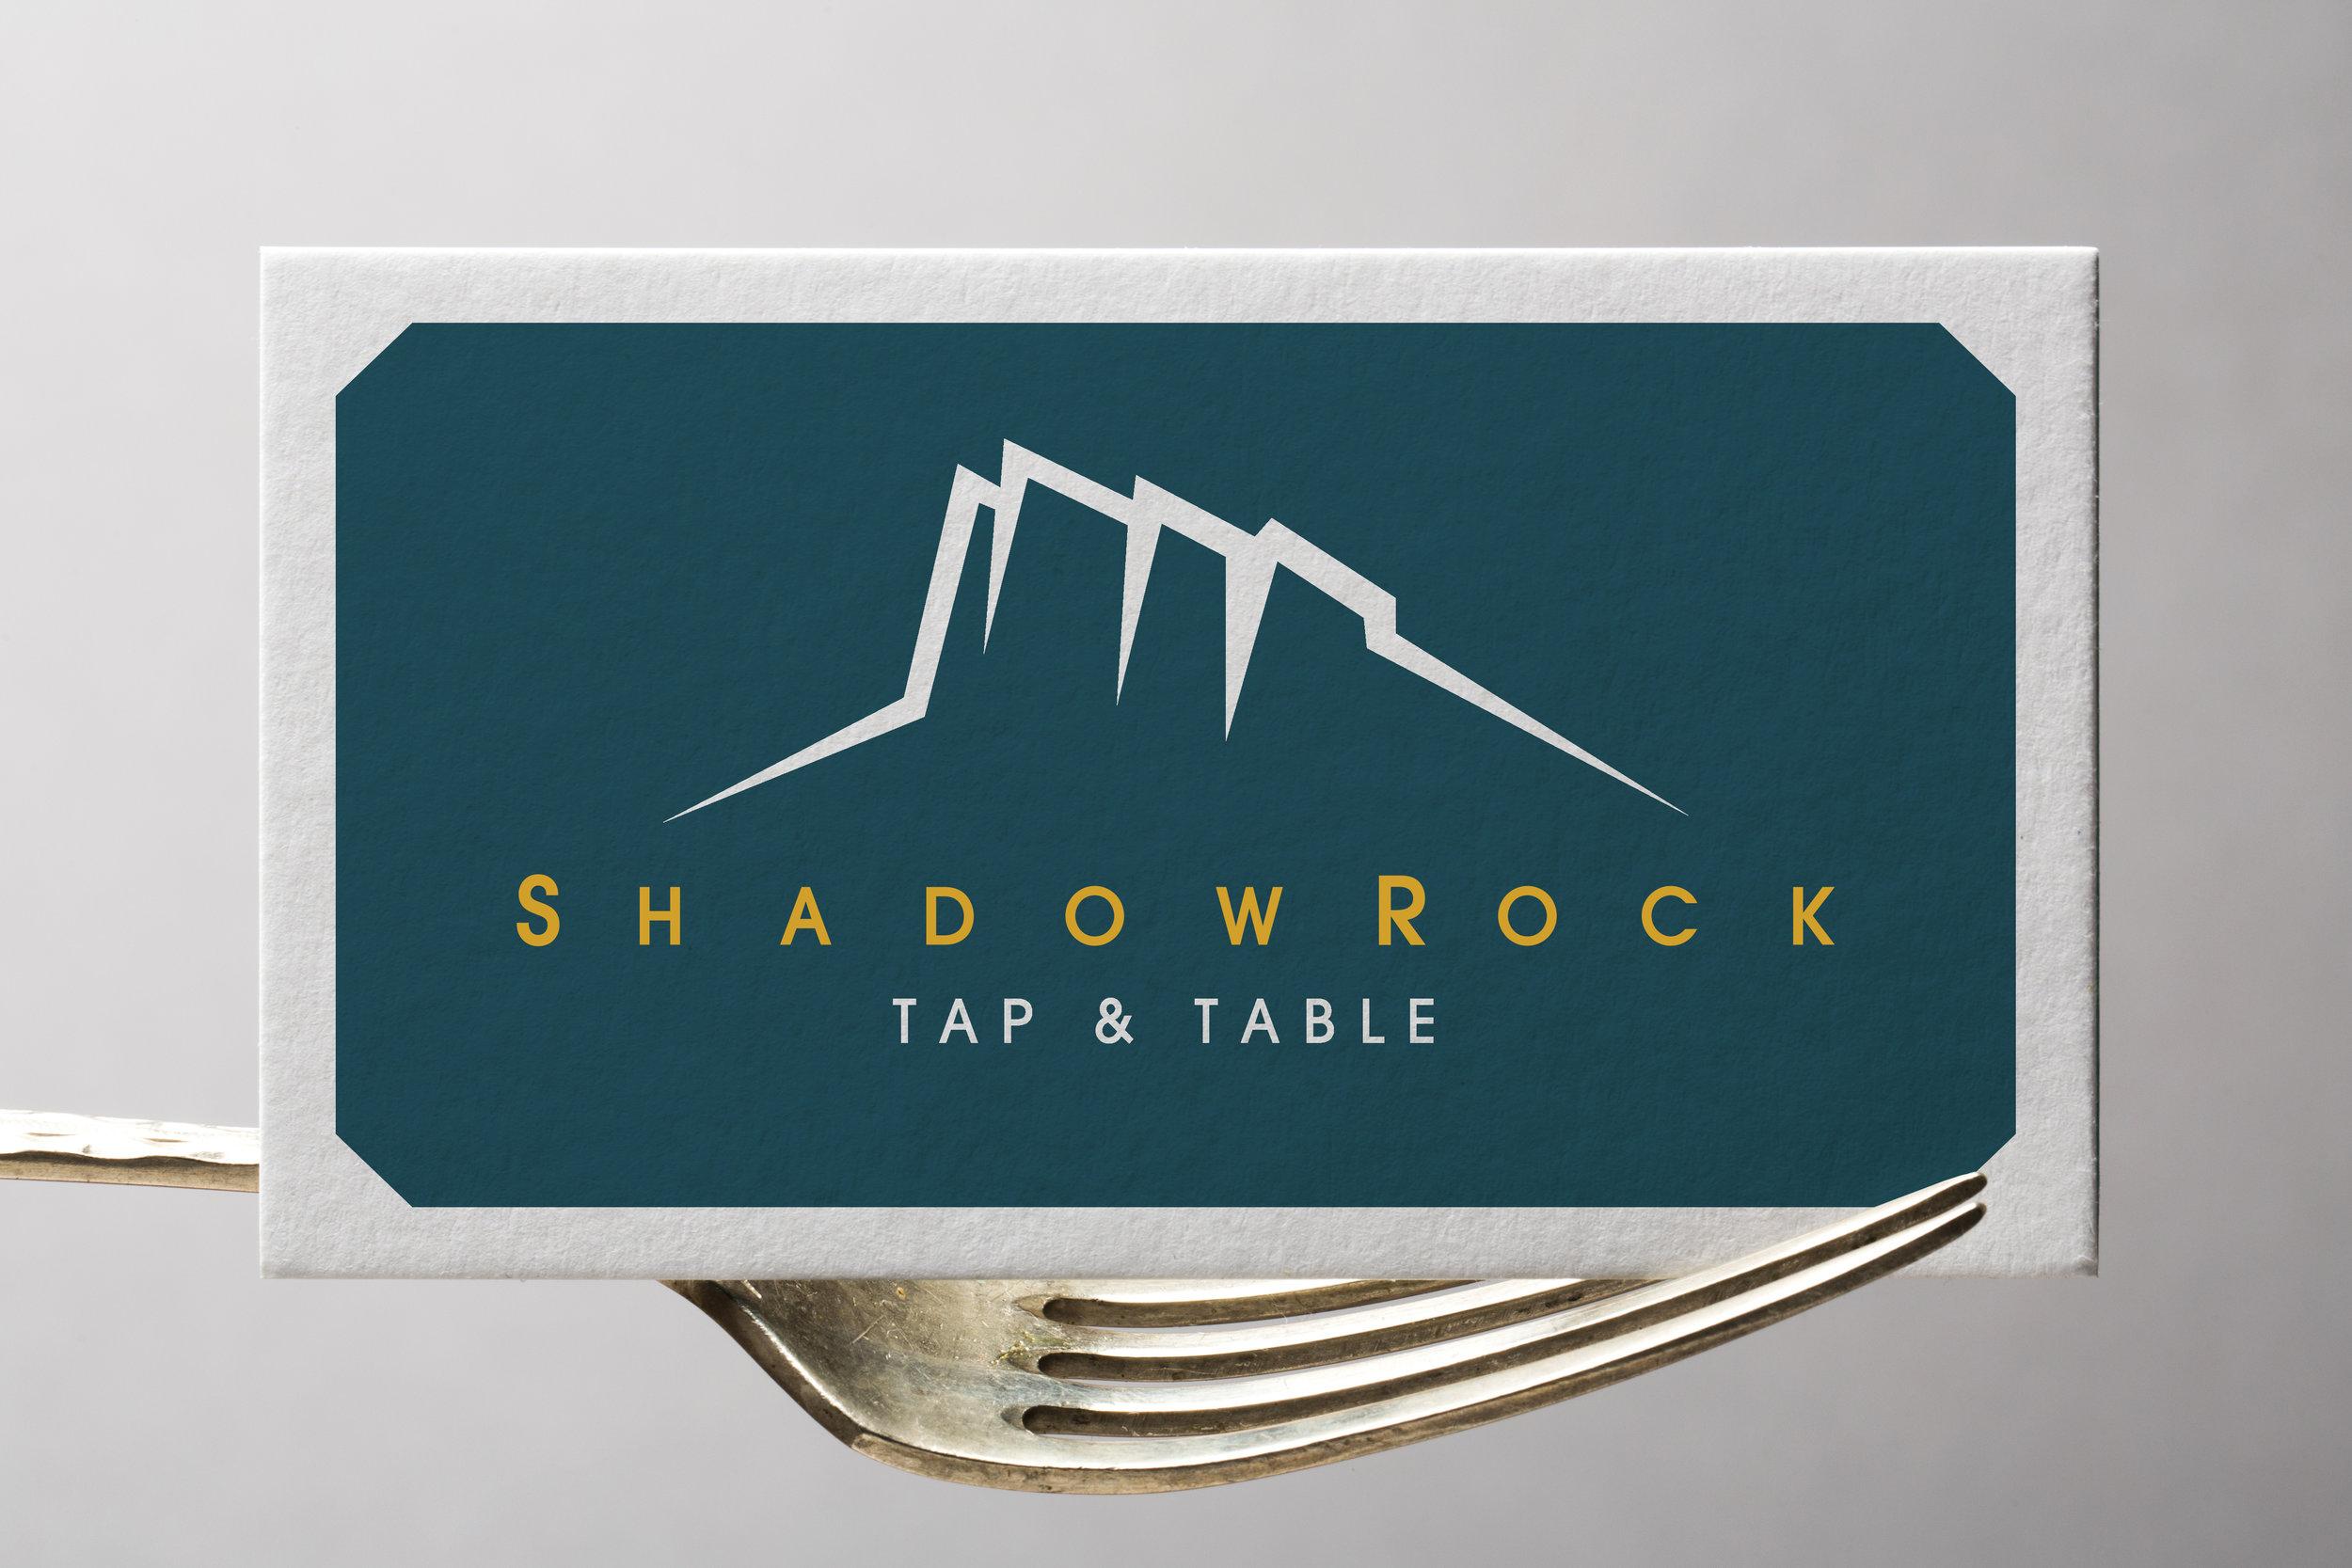 Hilton Sedona Shadowrock Tap & Table Branding Business Cards